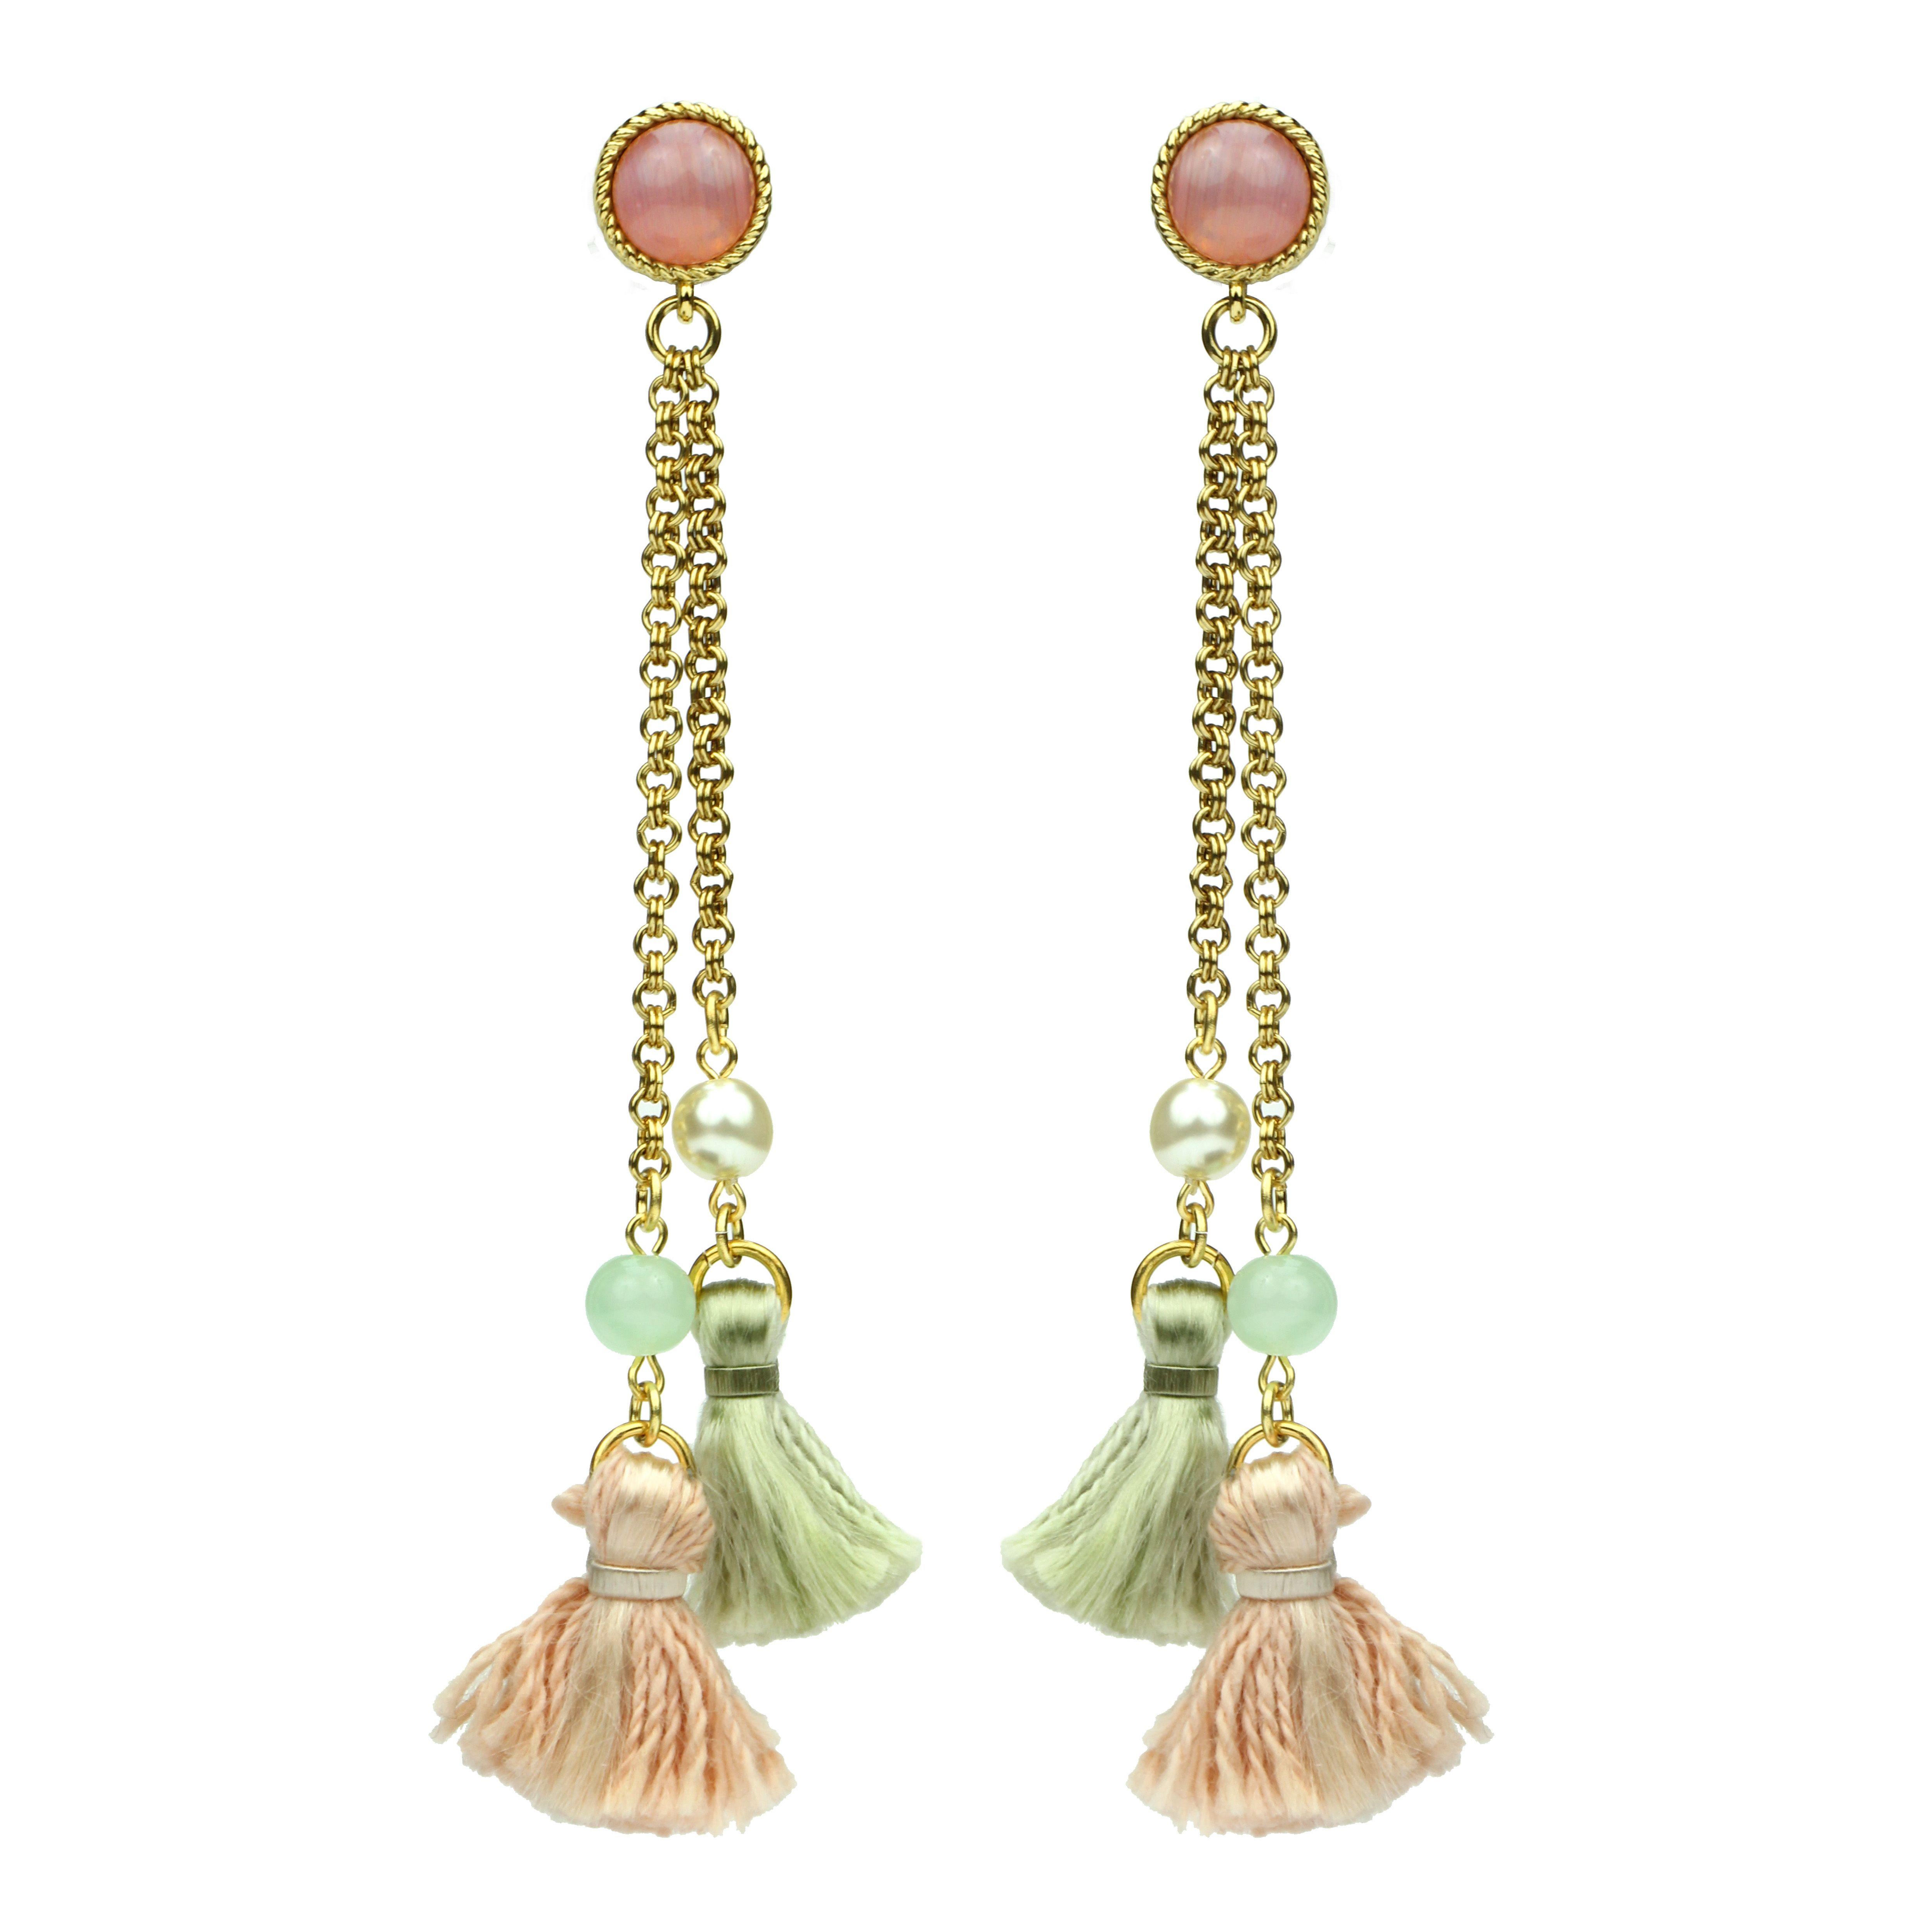 e39eb7a53 Long Tassel Drop earrings #flower #pink #petals #Ben-amun #tassles #gold # earrings